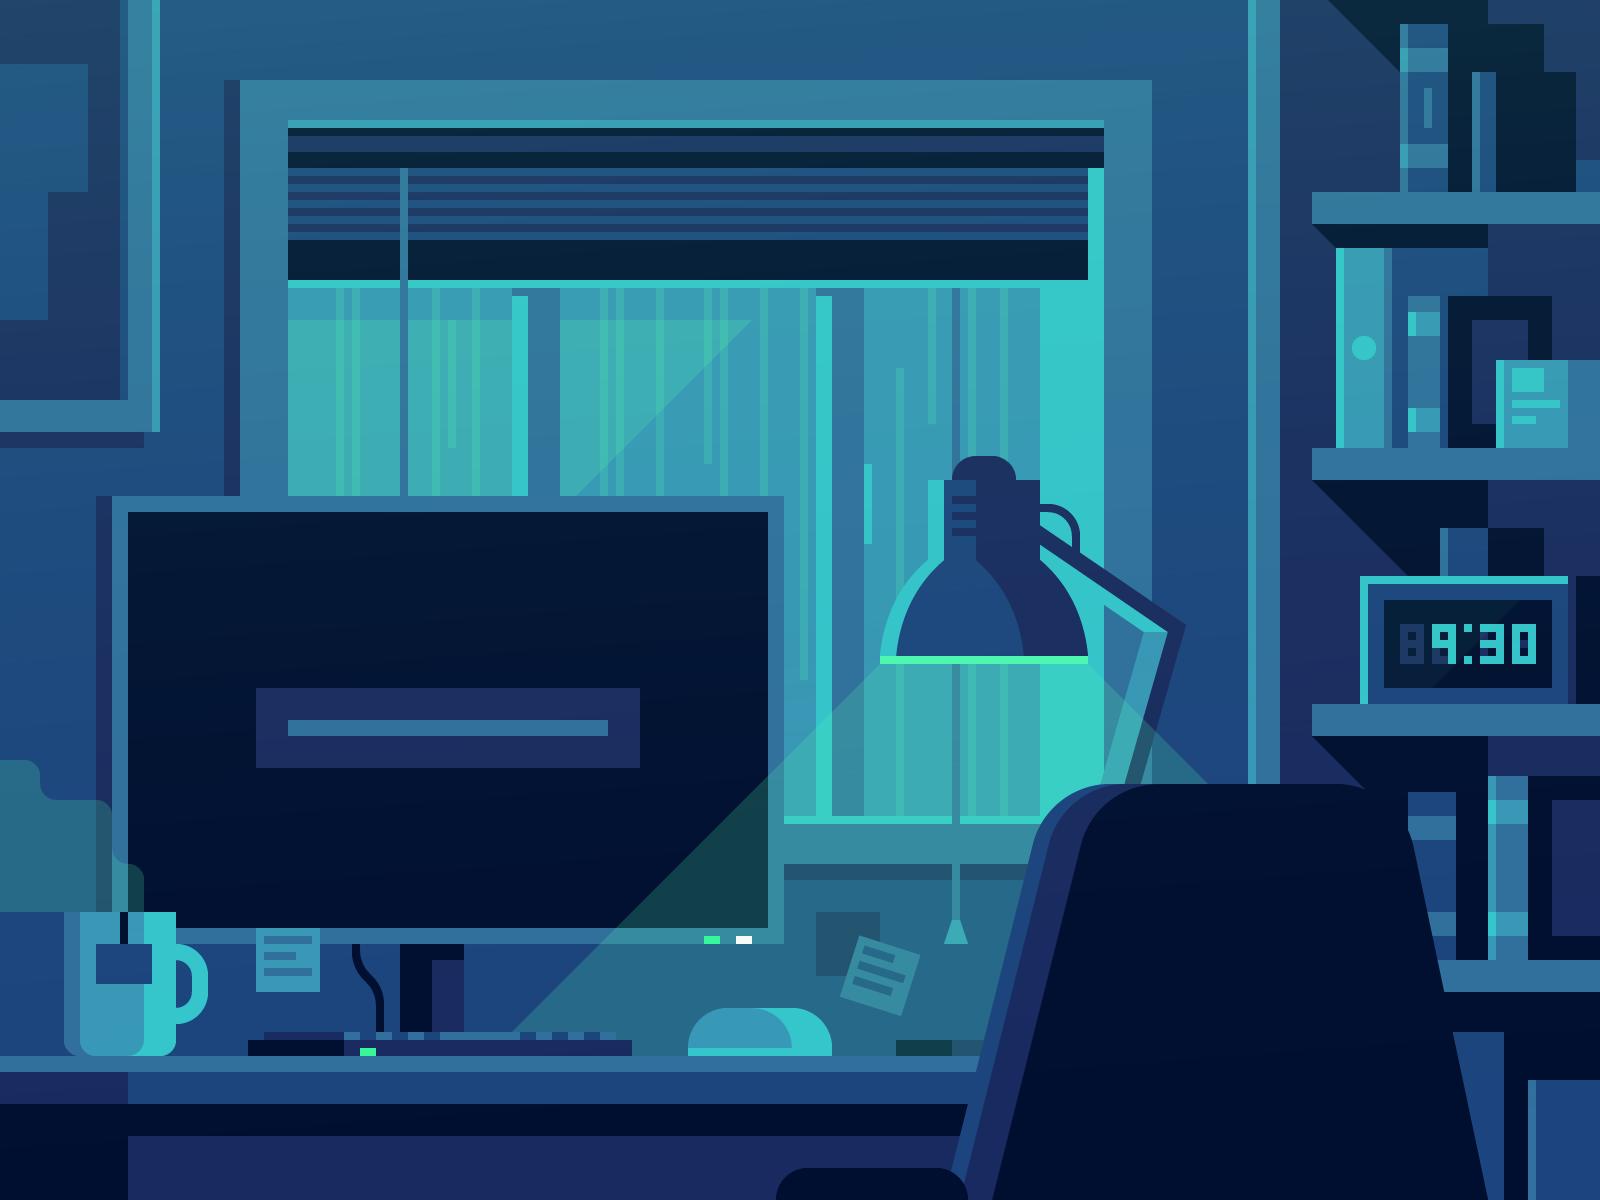 Rainy Night illustration by Alex Pasquarella